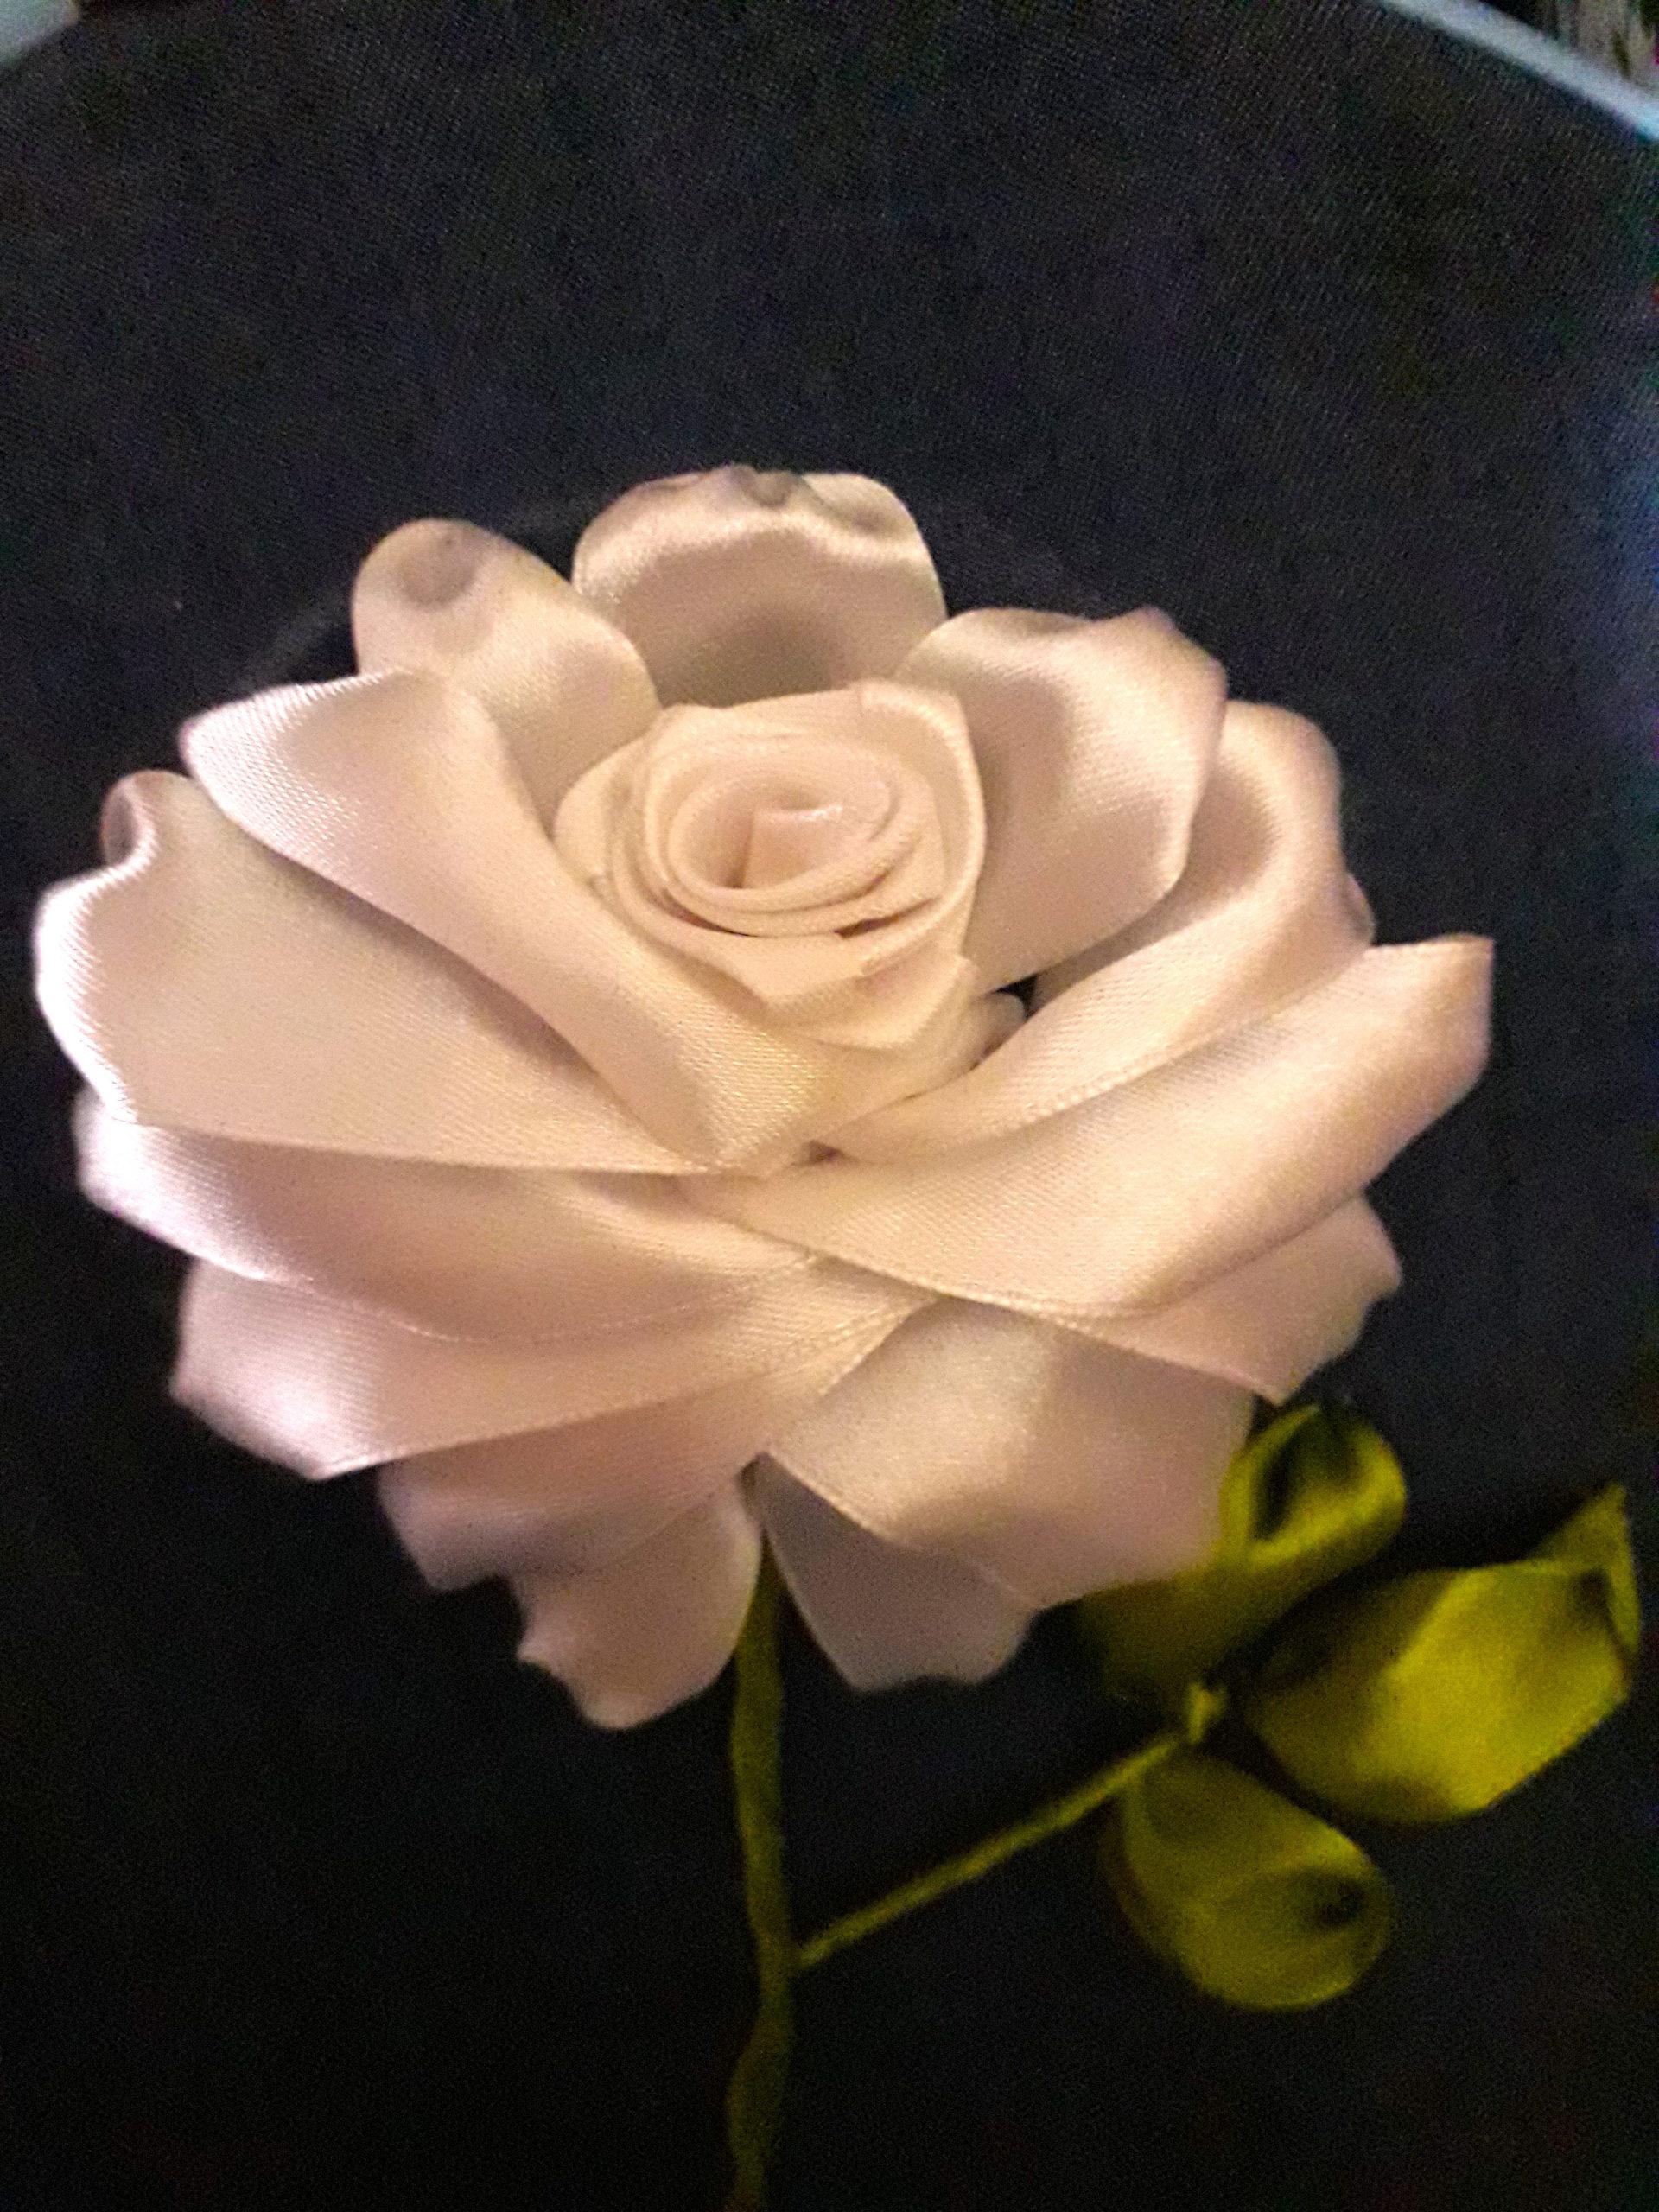 Вышивка лентами розы